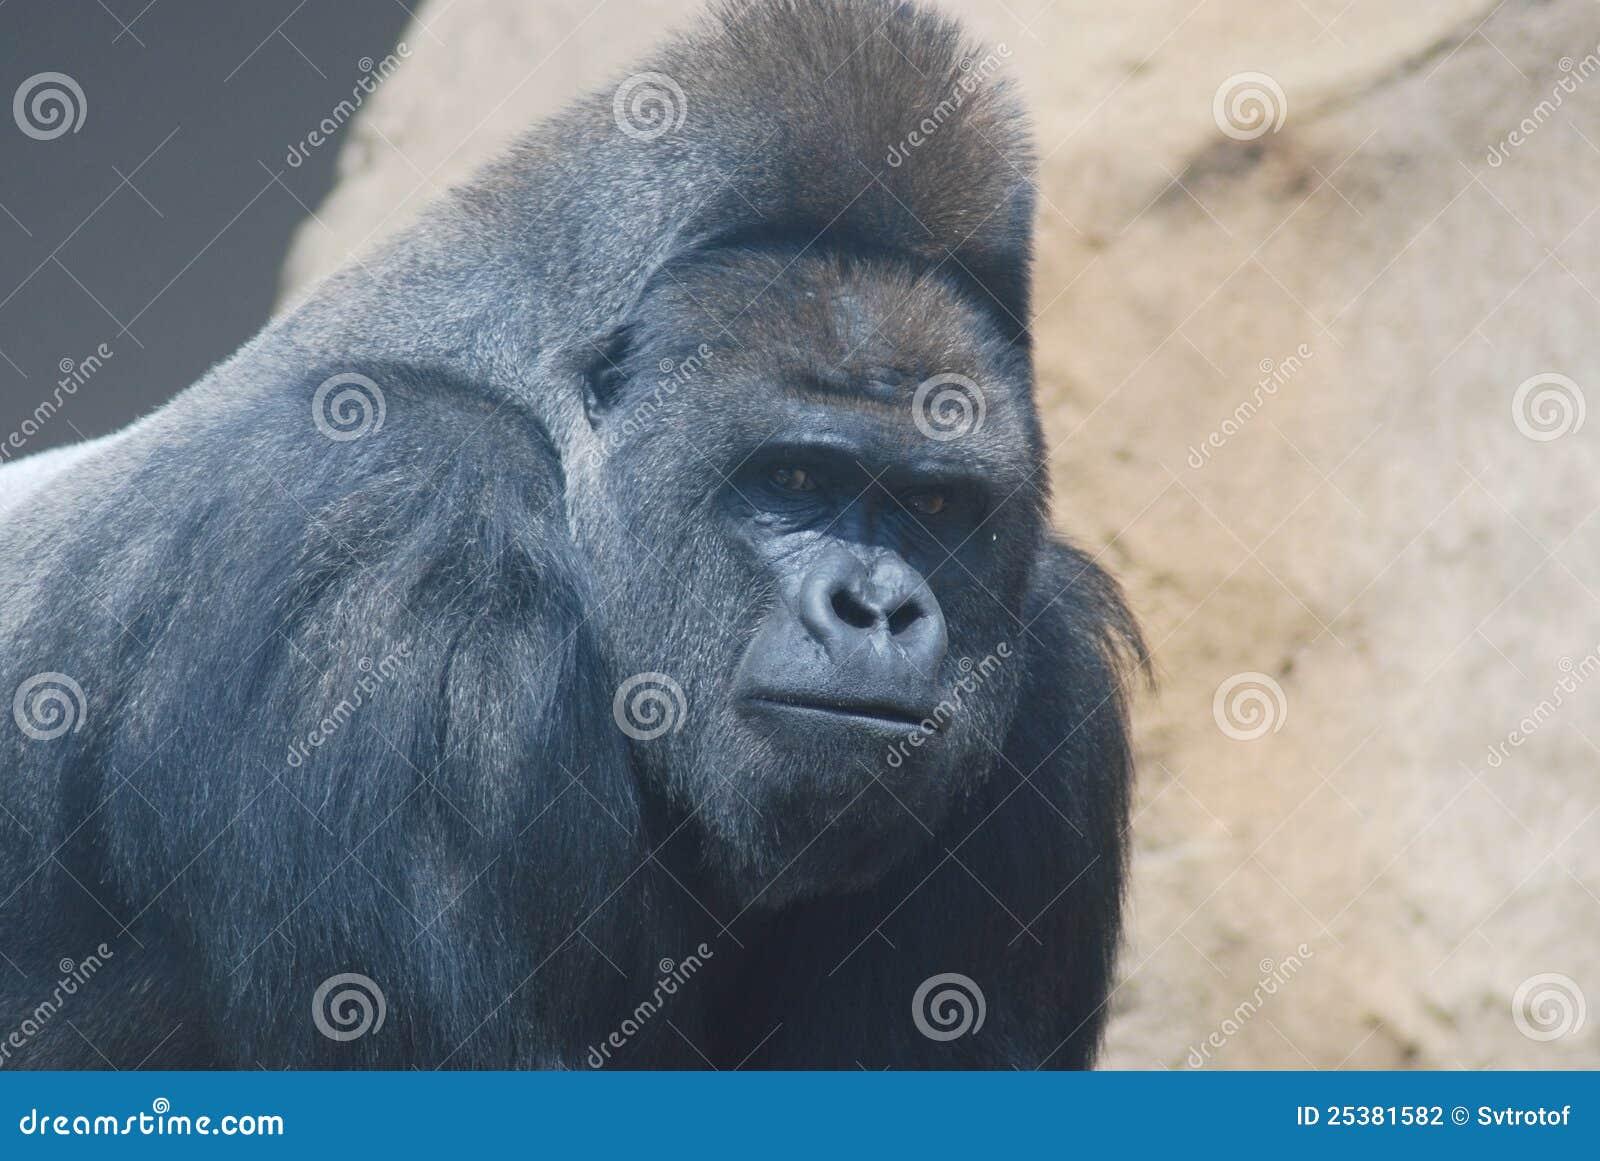 big black hairy gorilla stock photography image 25381582